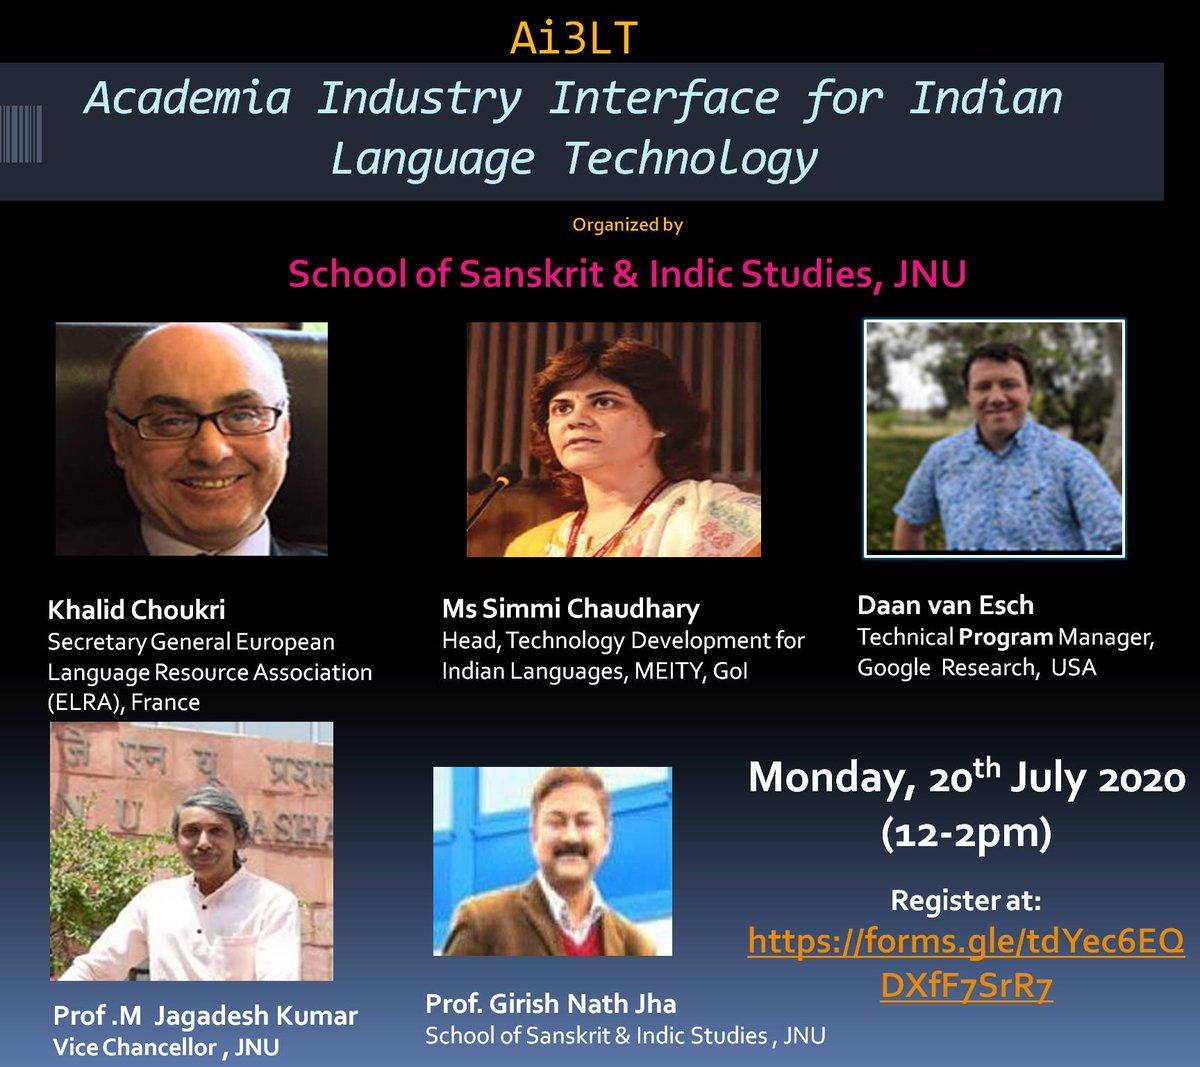 First Ai3LT webinar organized by JNU on Monday 20th July at 12-2pm IST. Please register free at  @ELRAnews @Google @GoogleAI  @GoogleIndia @jha_maitreyi @mamidala90 @GoI_MeitY @MSFTResearch @amazonIN @SamsungIndia @glennAI @nlp @linguistlist @LinkedInNews